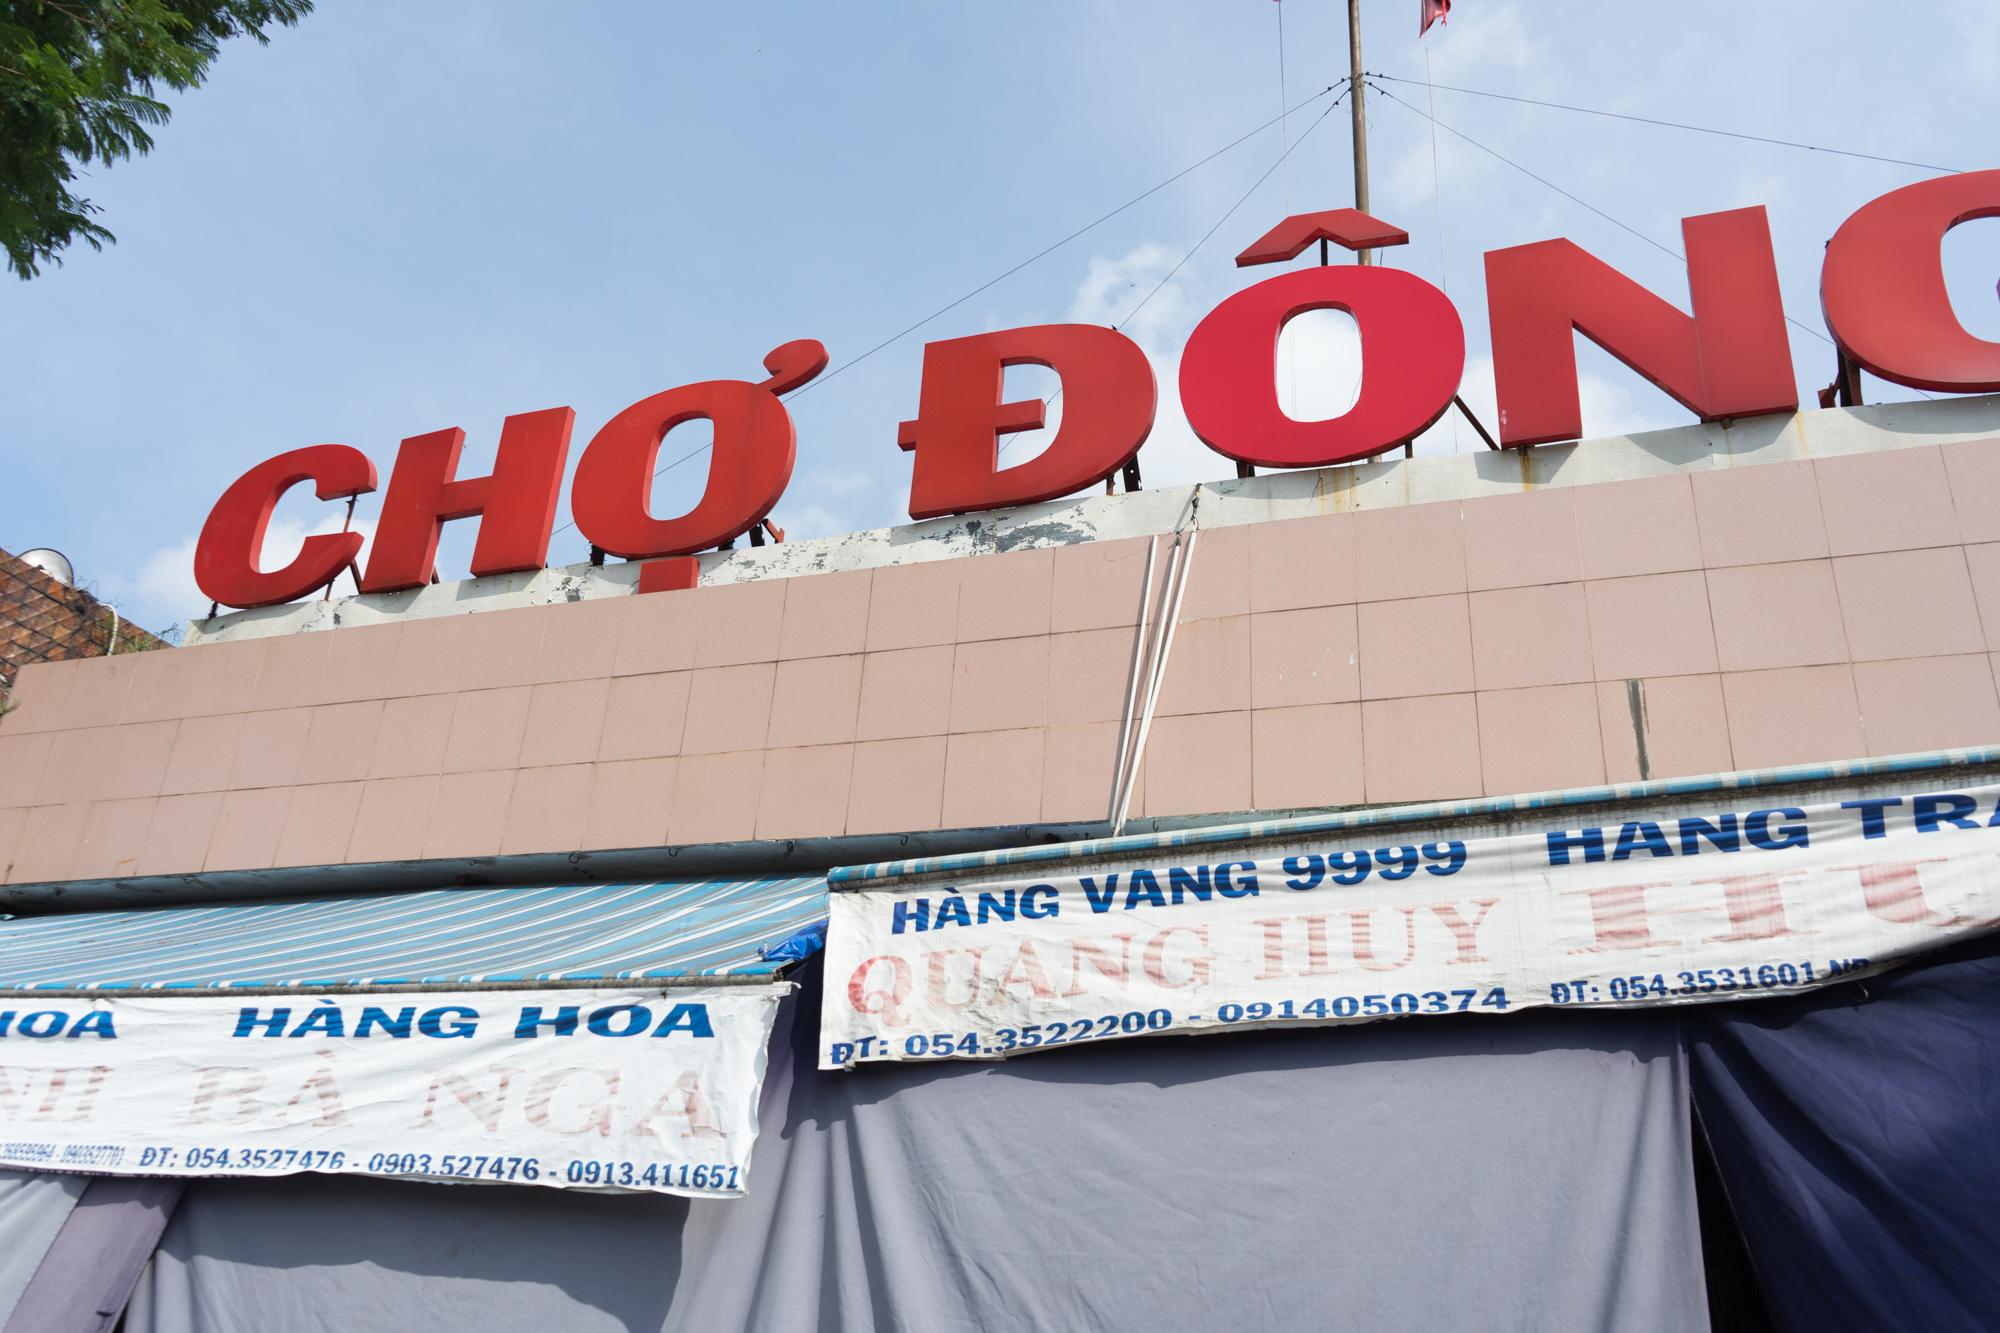 Dong Ba Market in Hue Vietnam